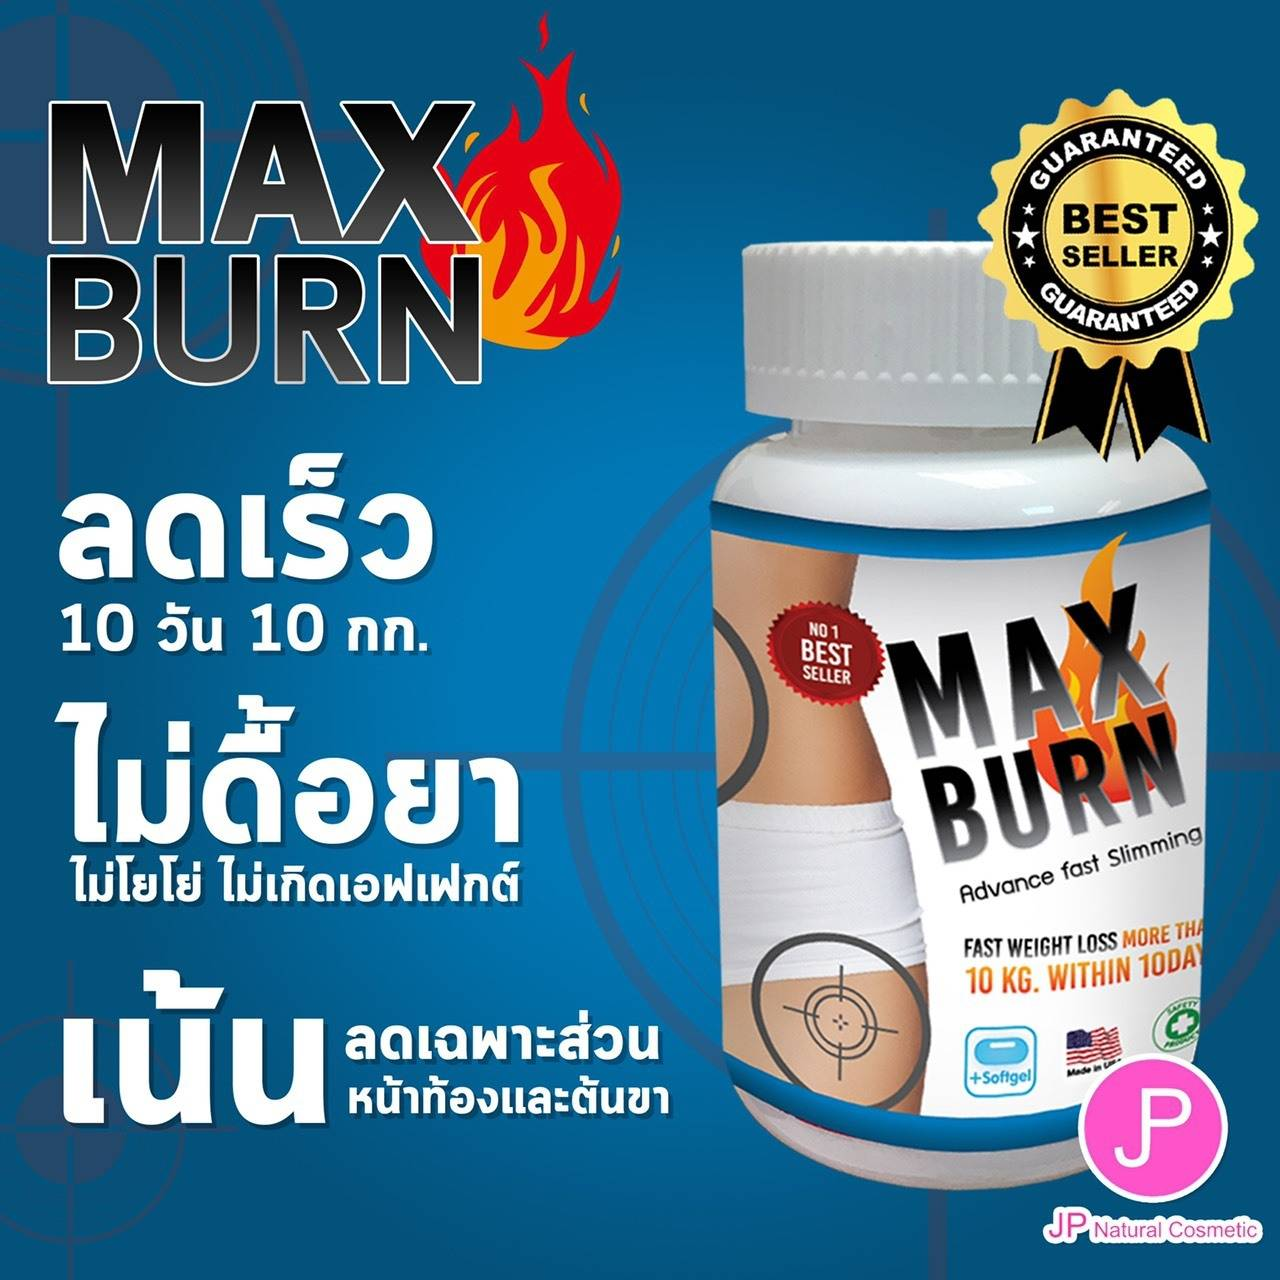 Max Burn Advance Fast Slimming 30 เม็ด ช่วยลดความอยากอาหาร ลดการดูดซึมไขมัน ดักจับแป้ง  และน้ำตาล สูตรสำหรับคนดื้อยา